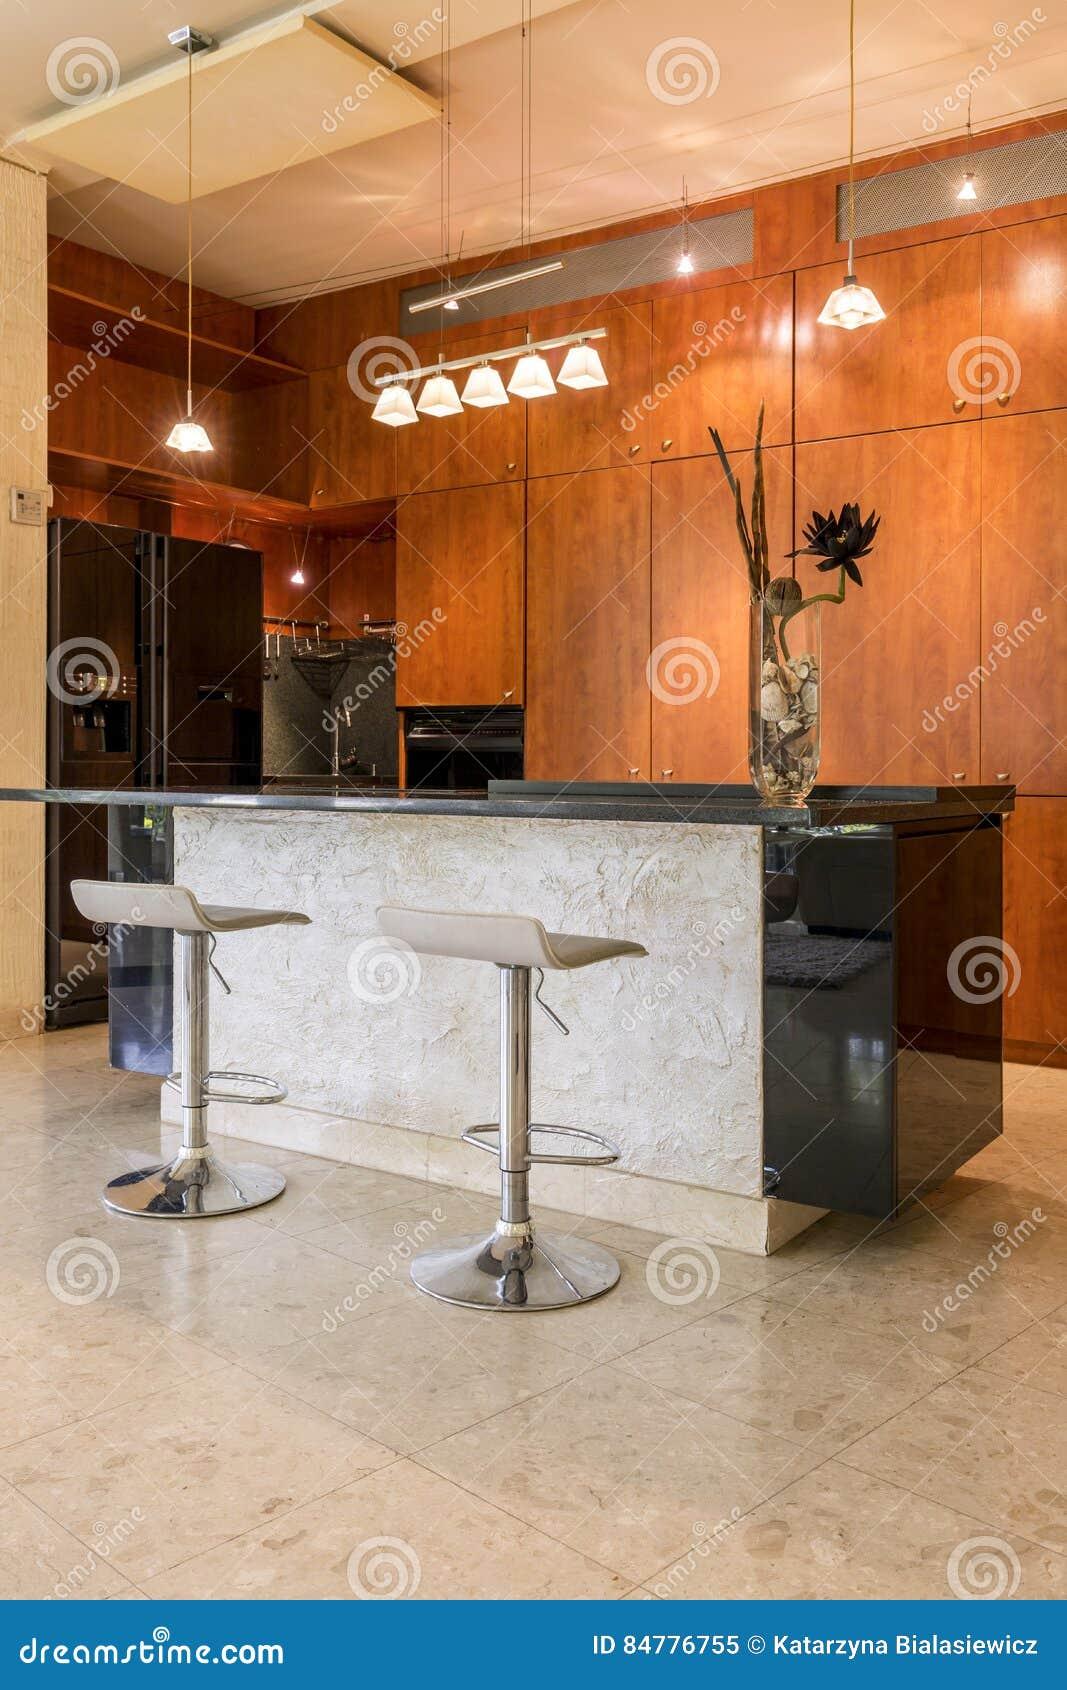 Stone Kitchen Island With Stools Stock Image Image Of Decor Equipment 84776755